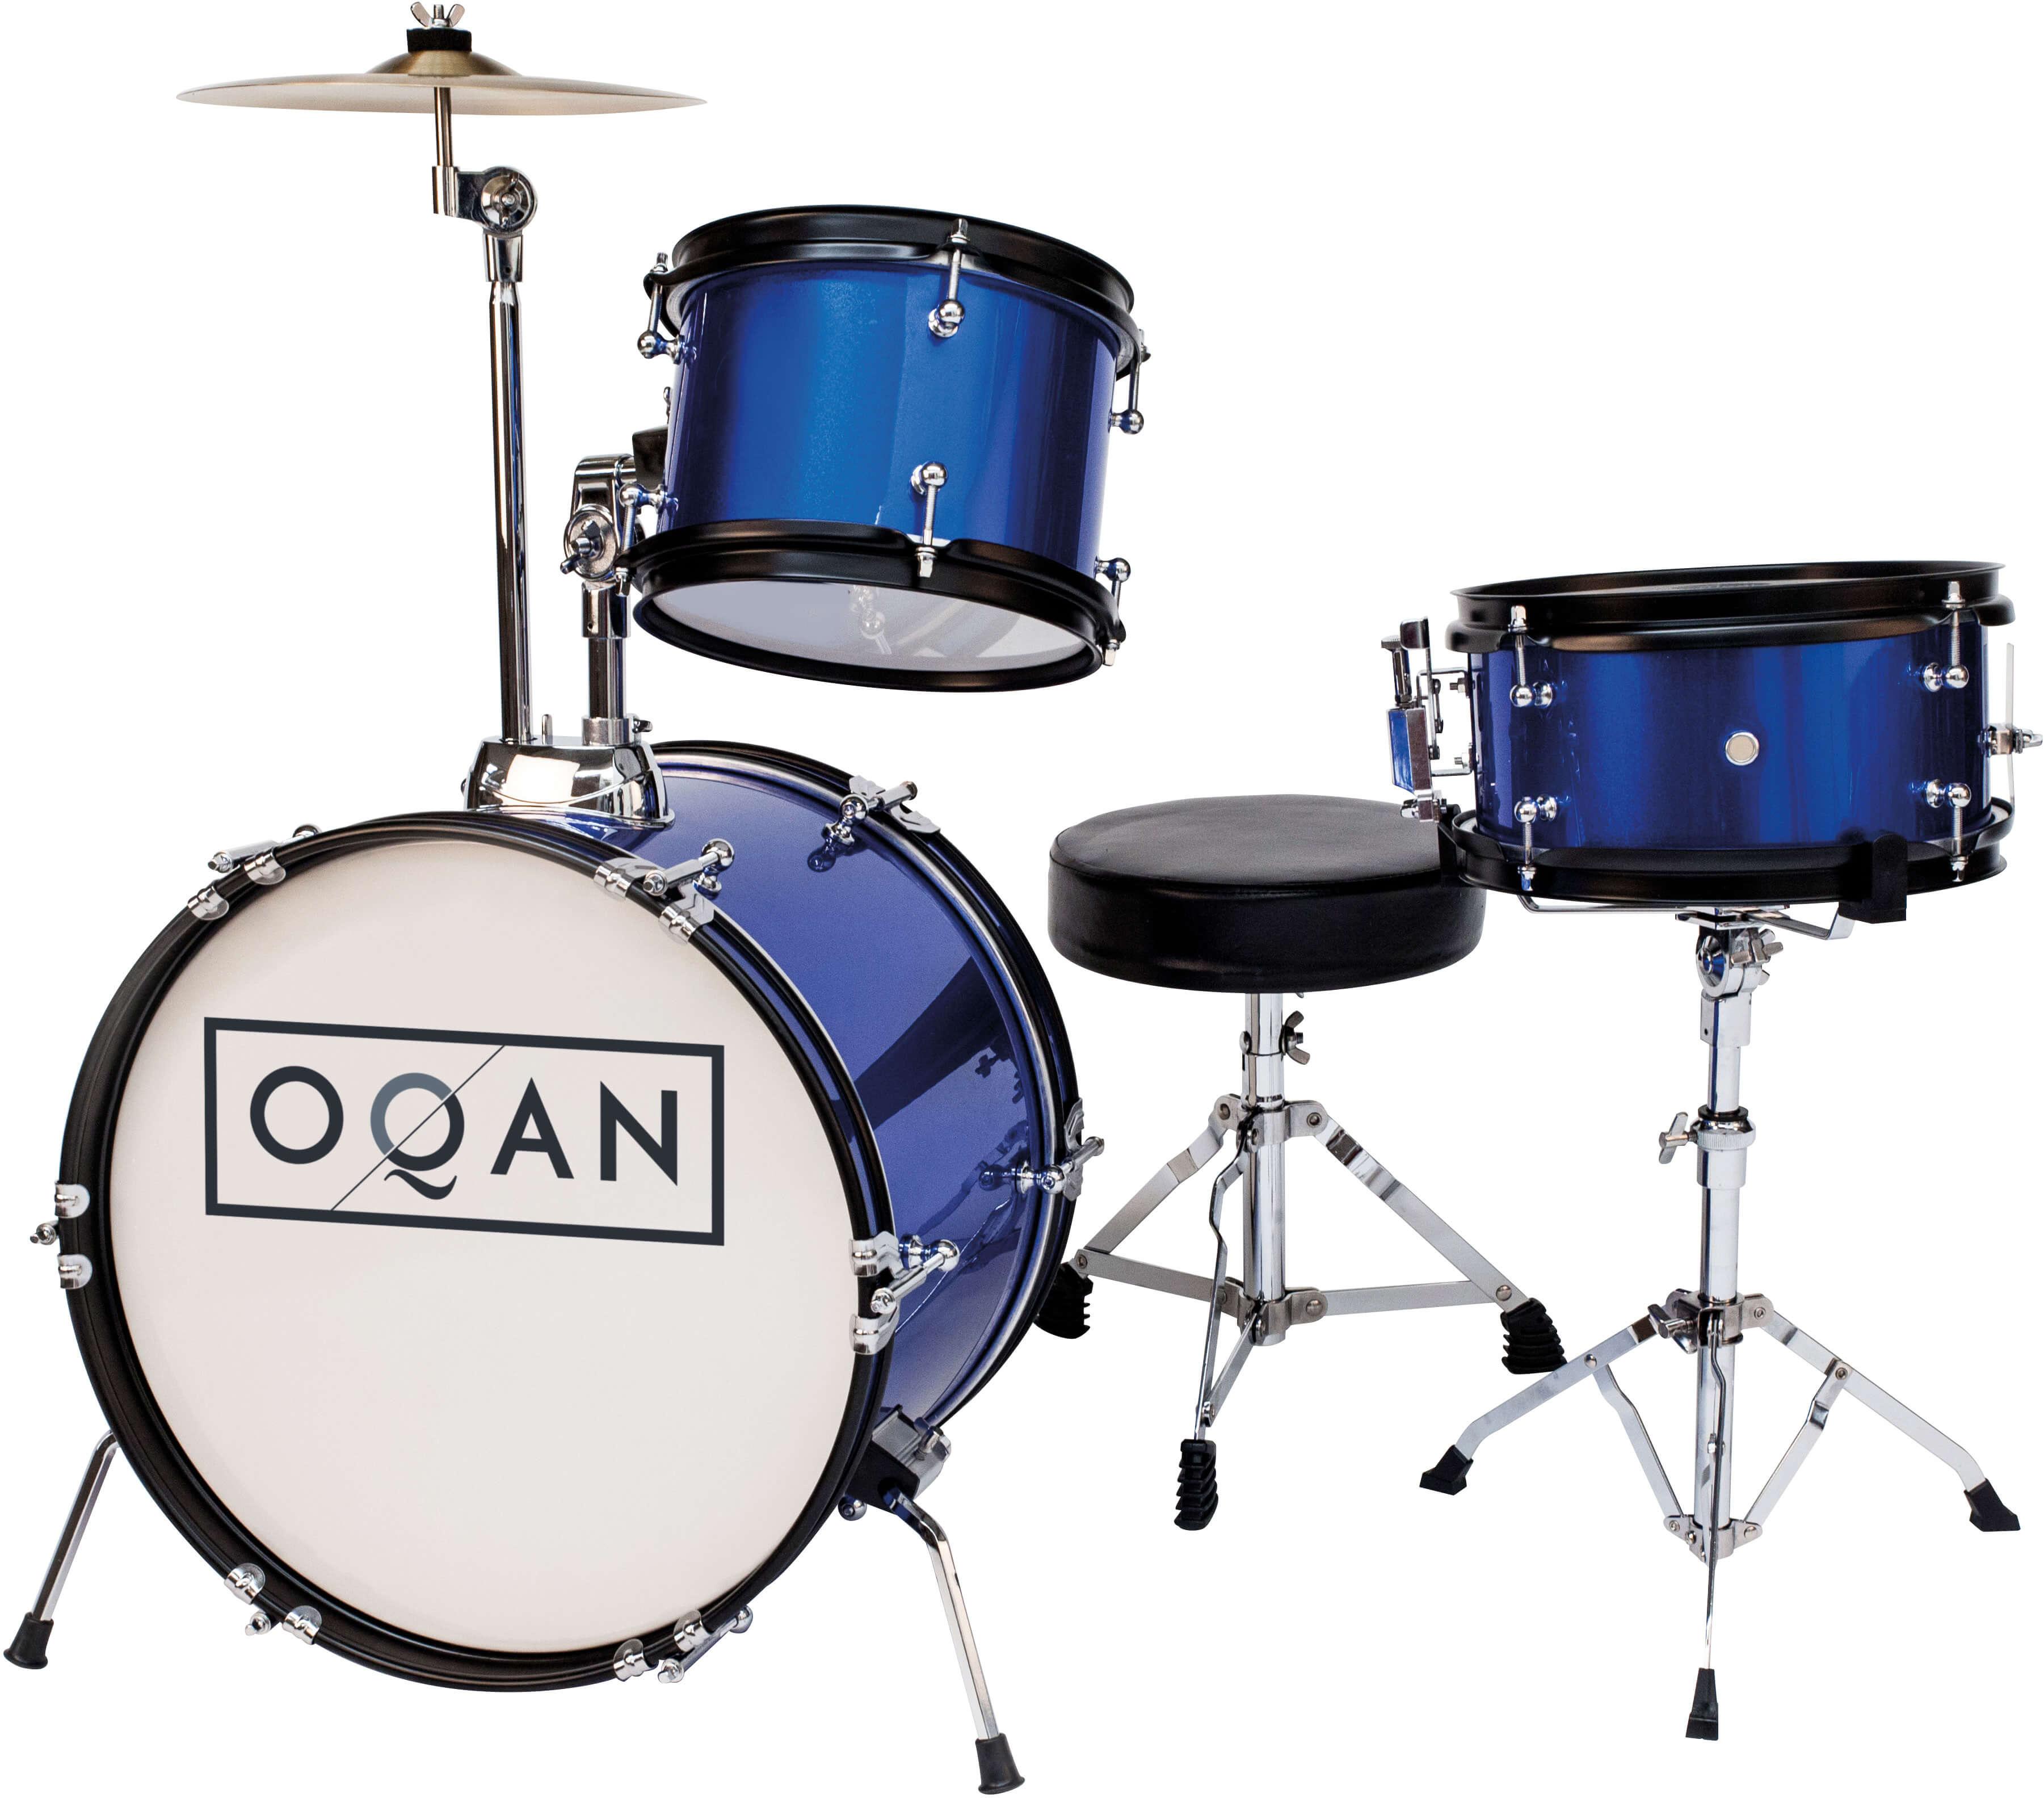 Batería Acústica Oqan Qpa-3 Infantil